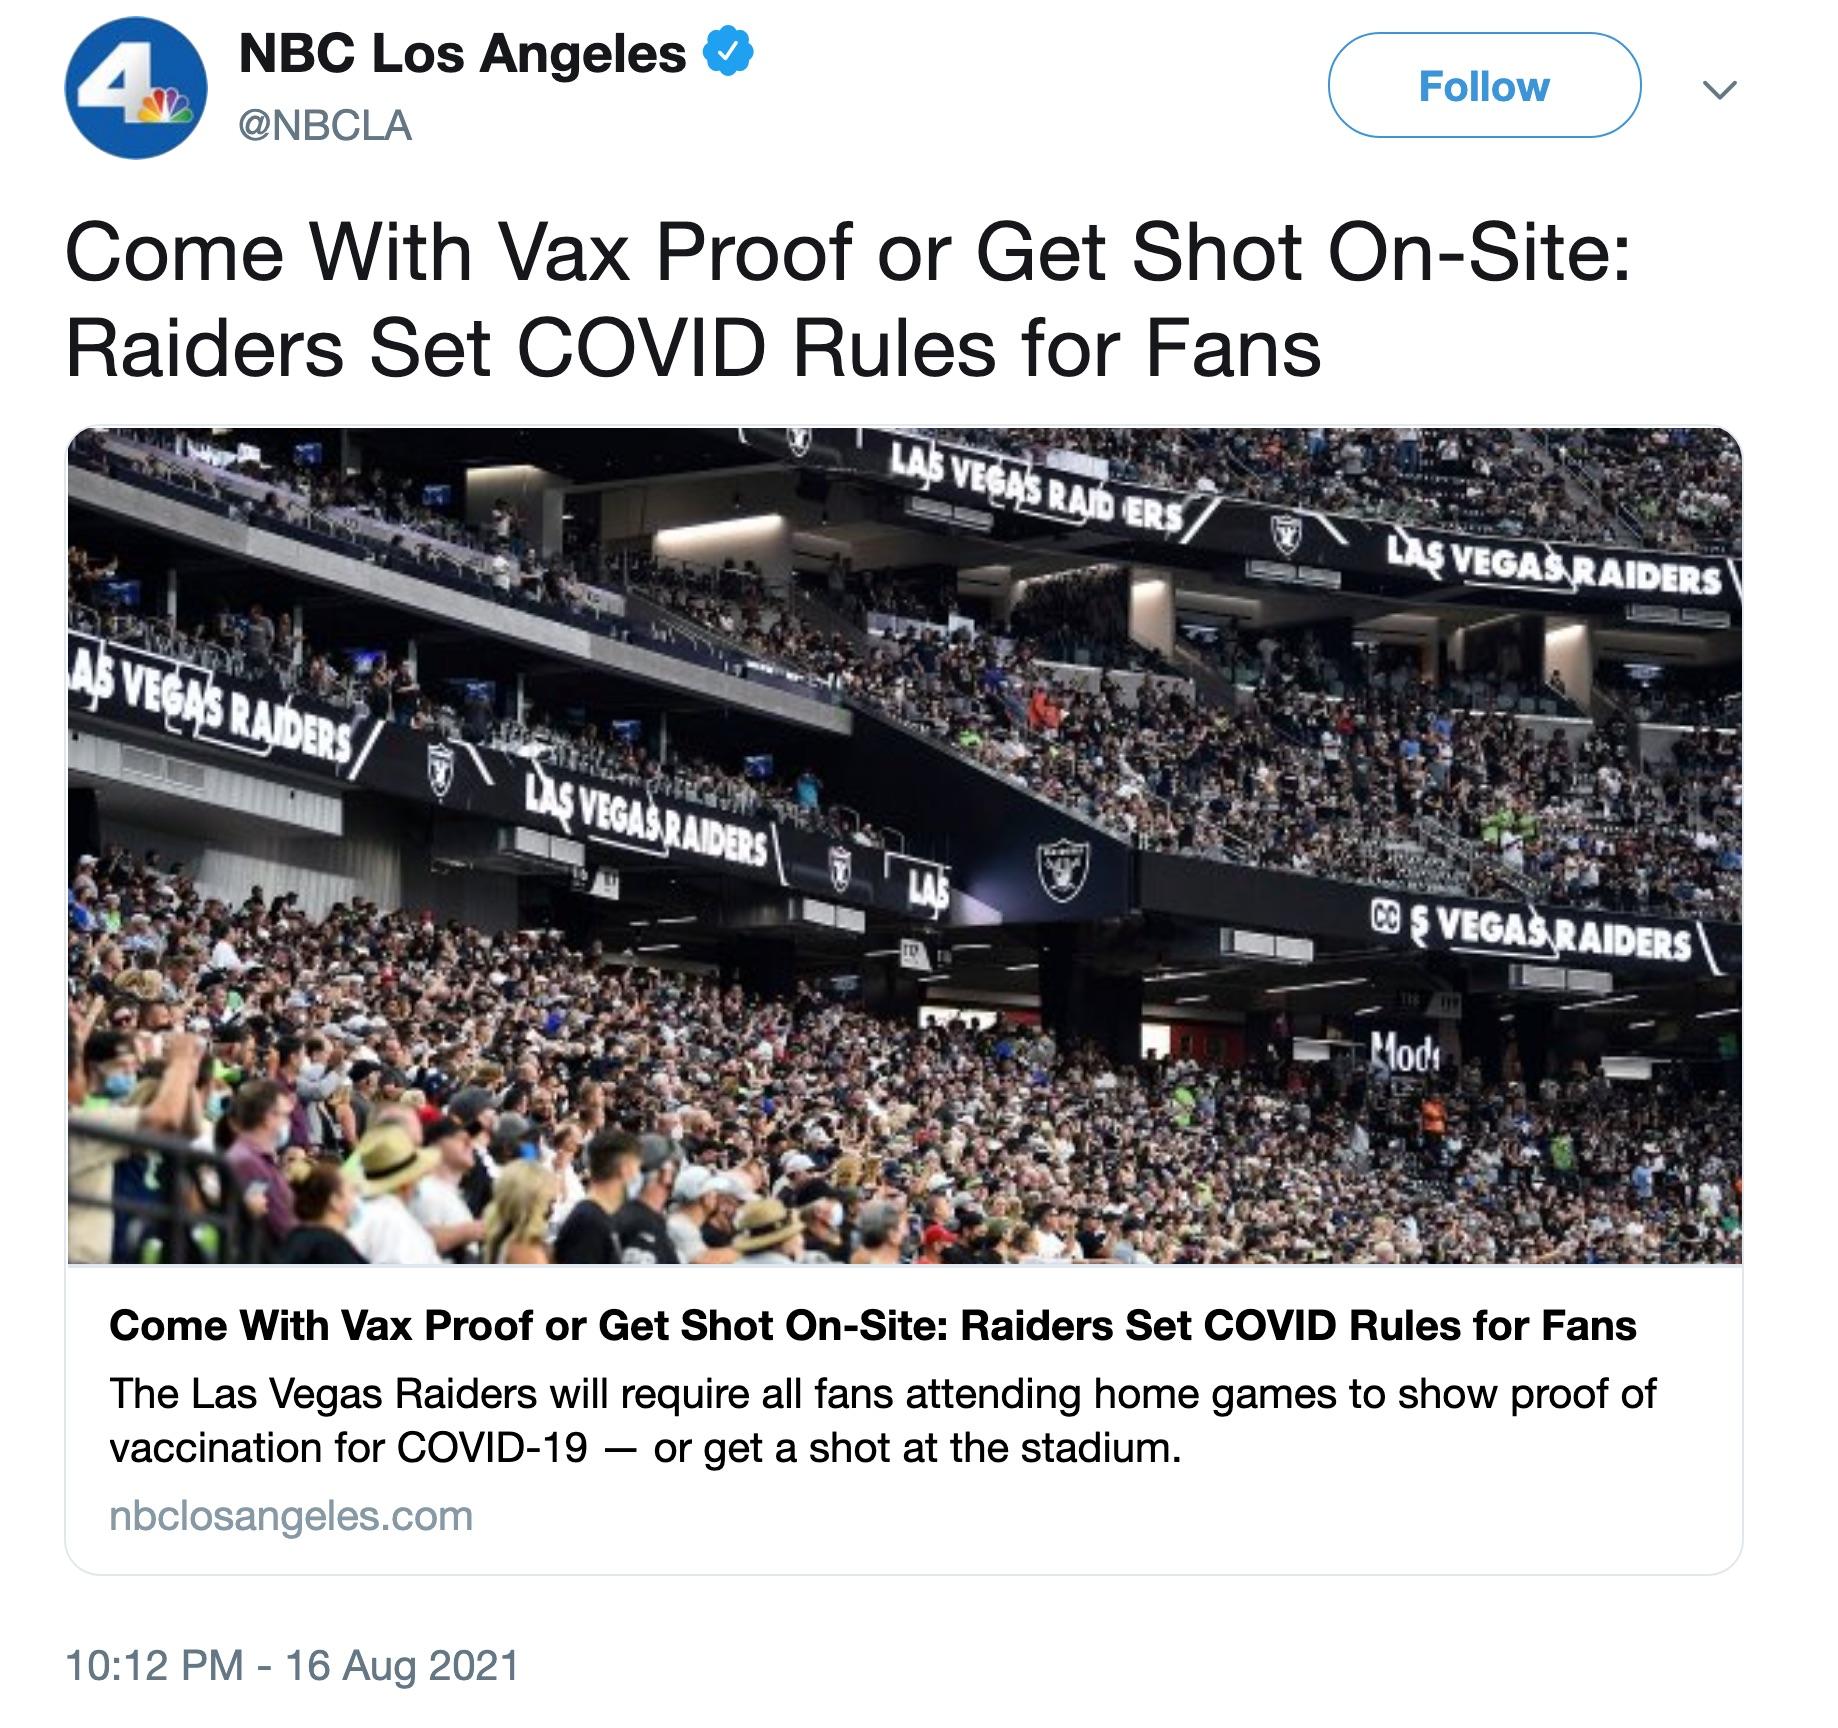 NBC LA shot on sight tweet deleted